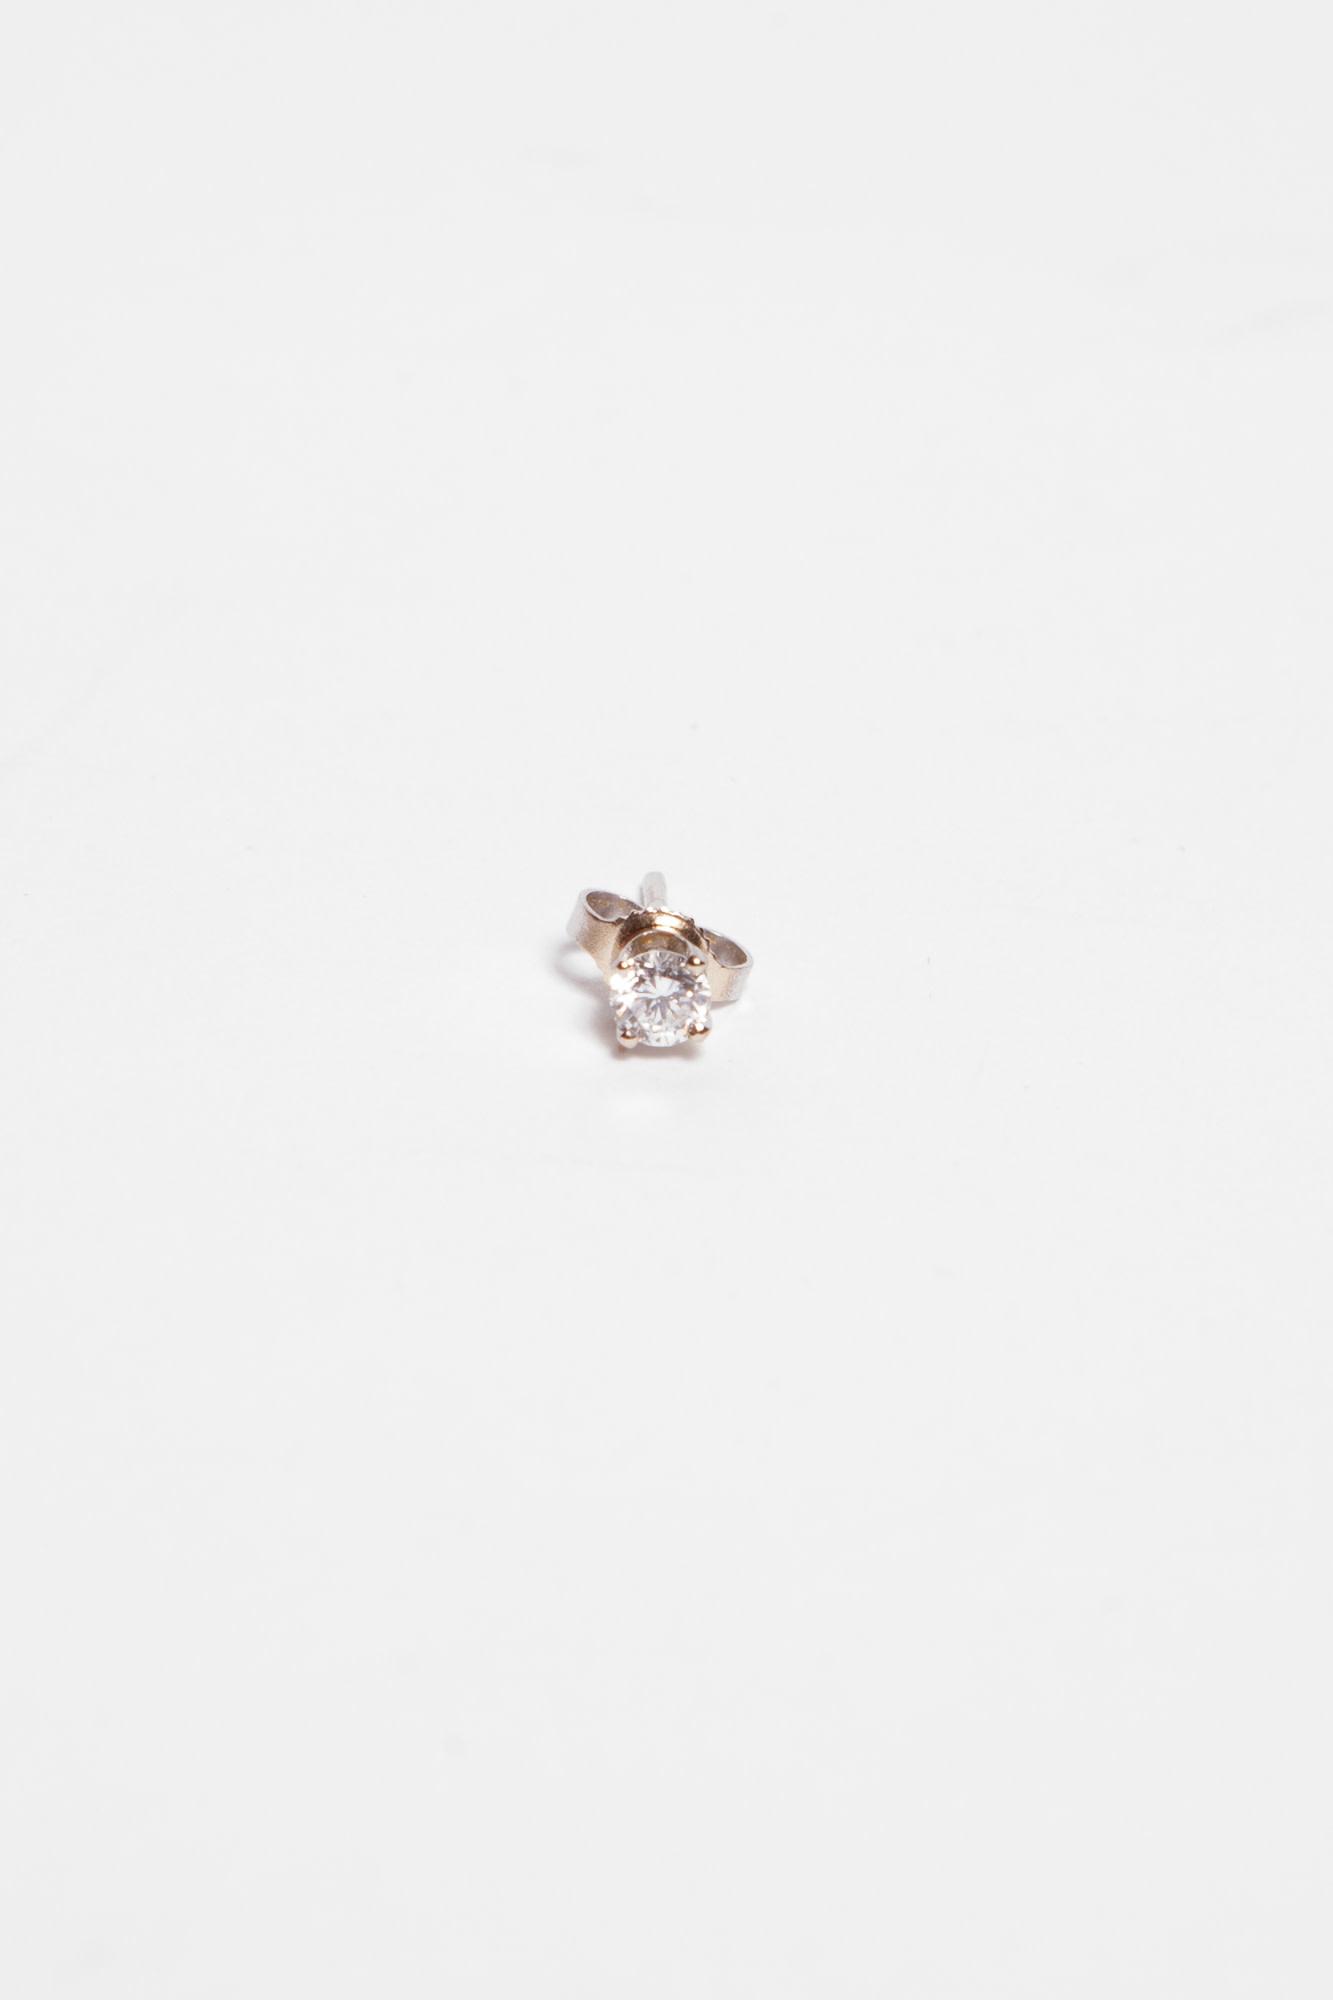 Birks EARRING IN 14 KT WHITE GOLD AND DIAMOND